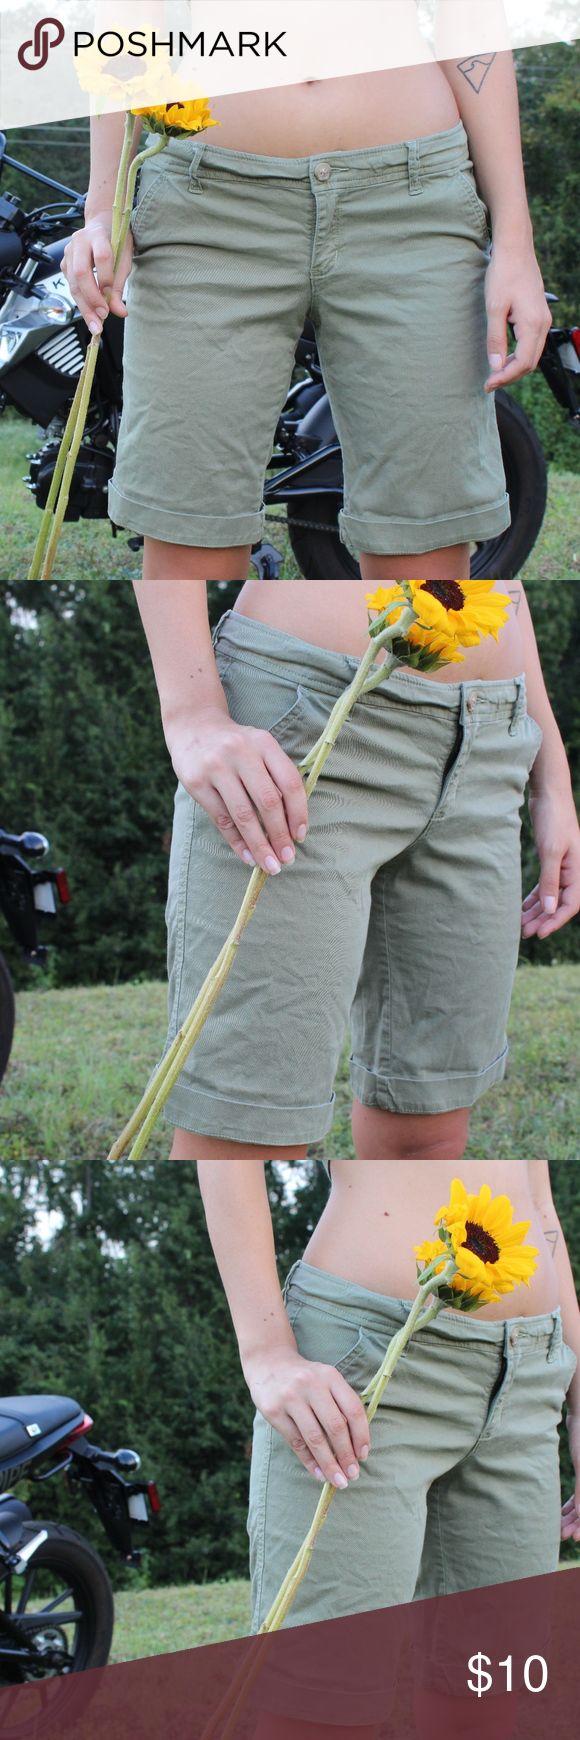 Hollister Shorts Size 9 beautiful olive green Hollister Shorts Hollister Shorts